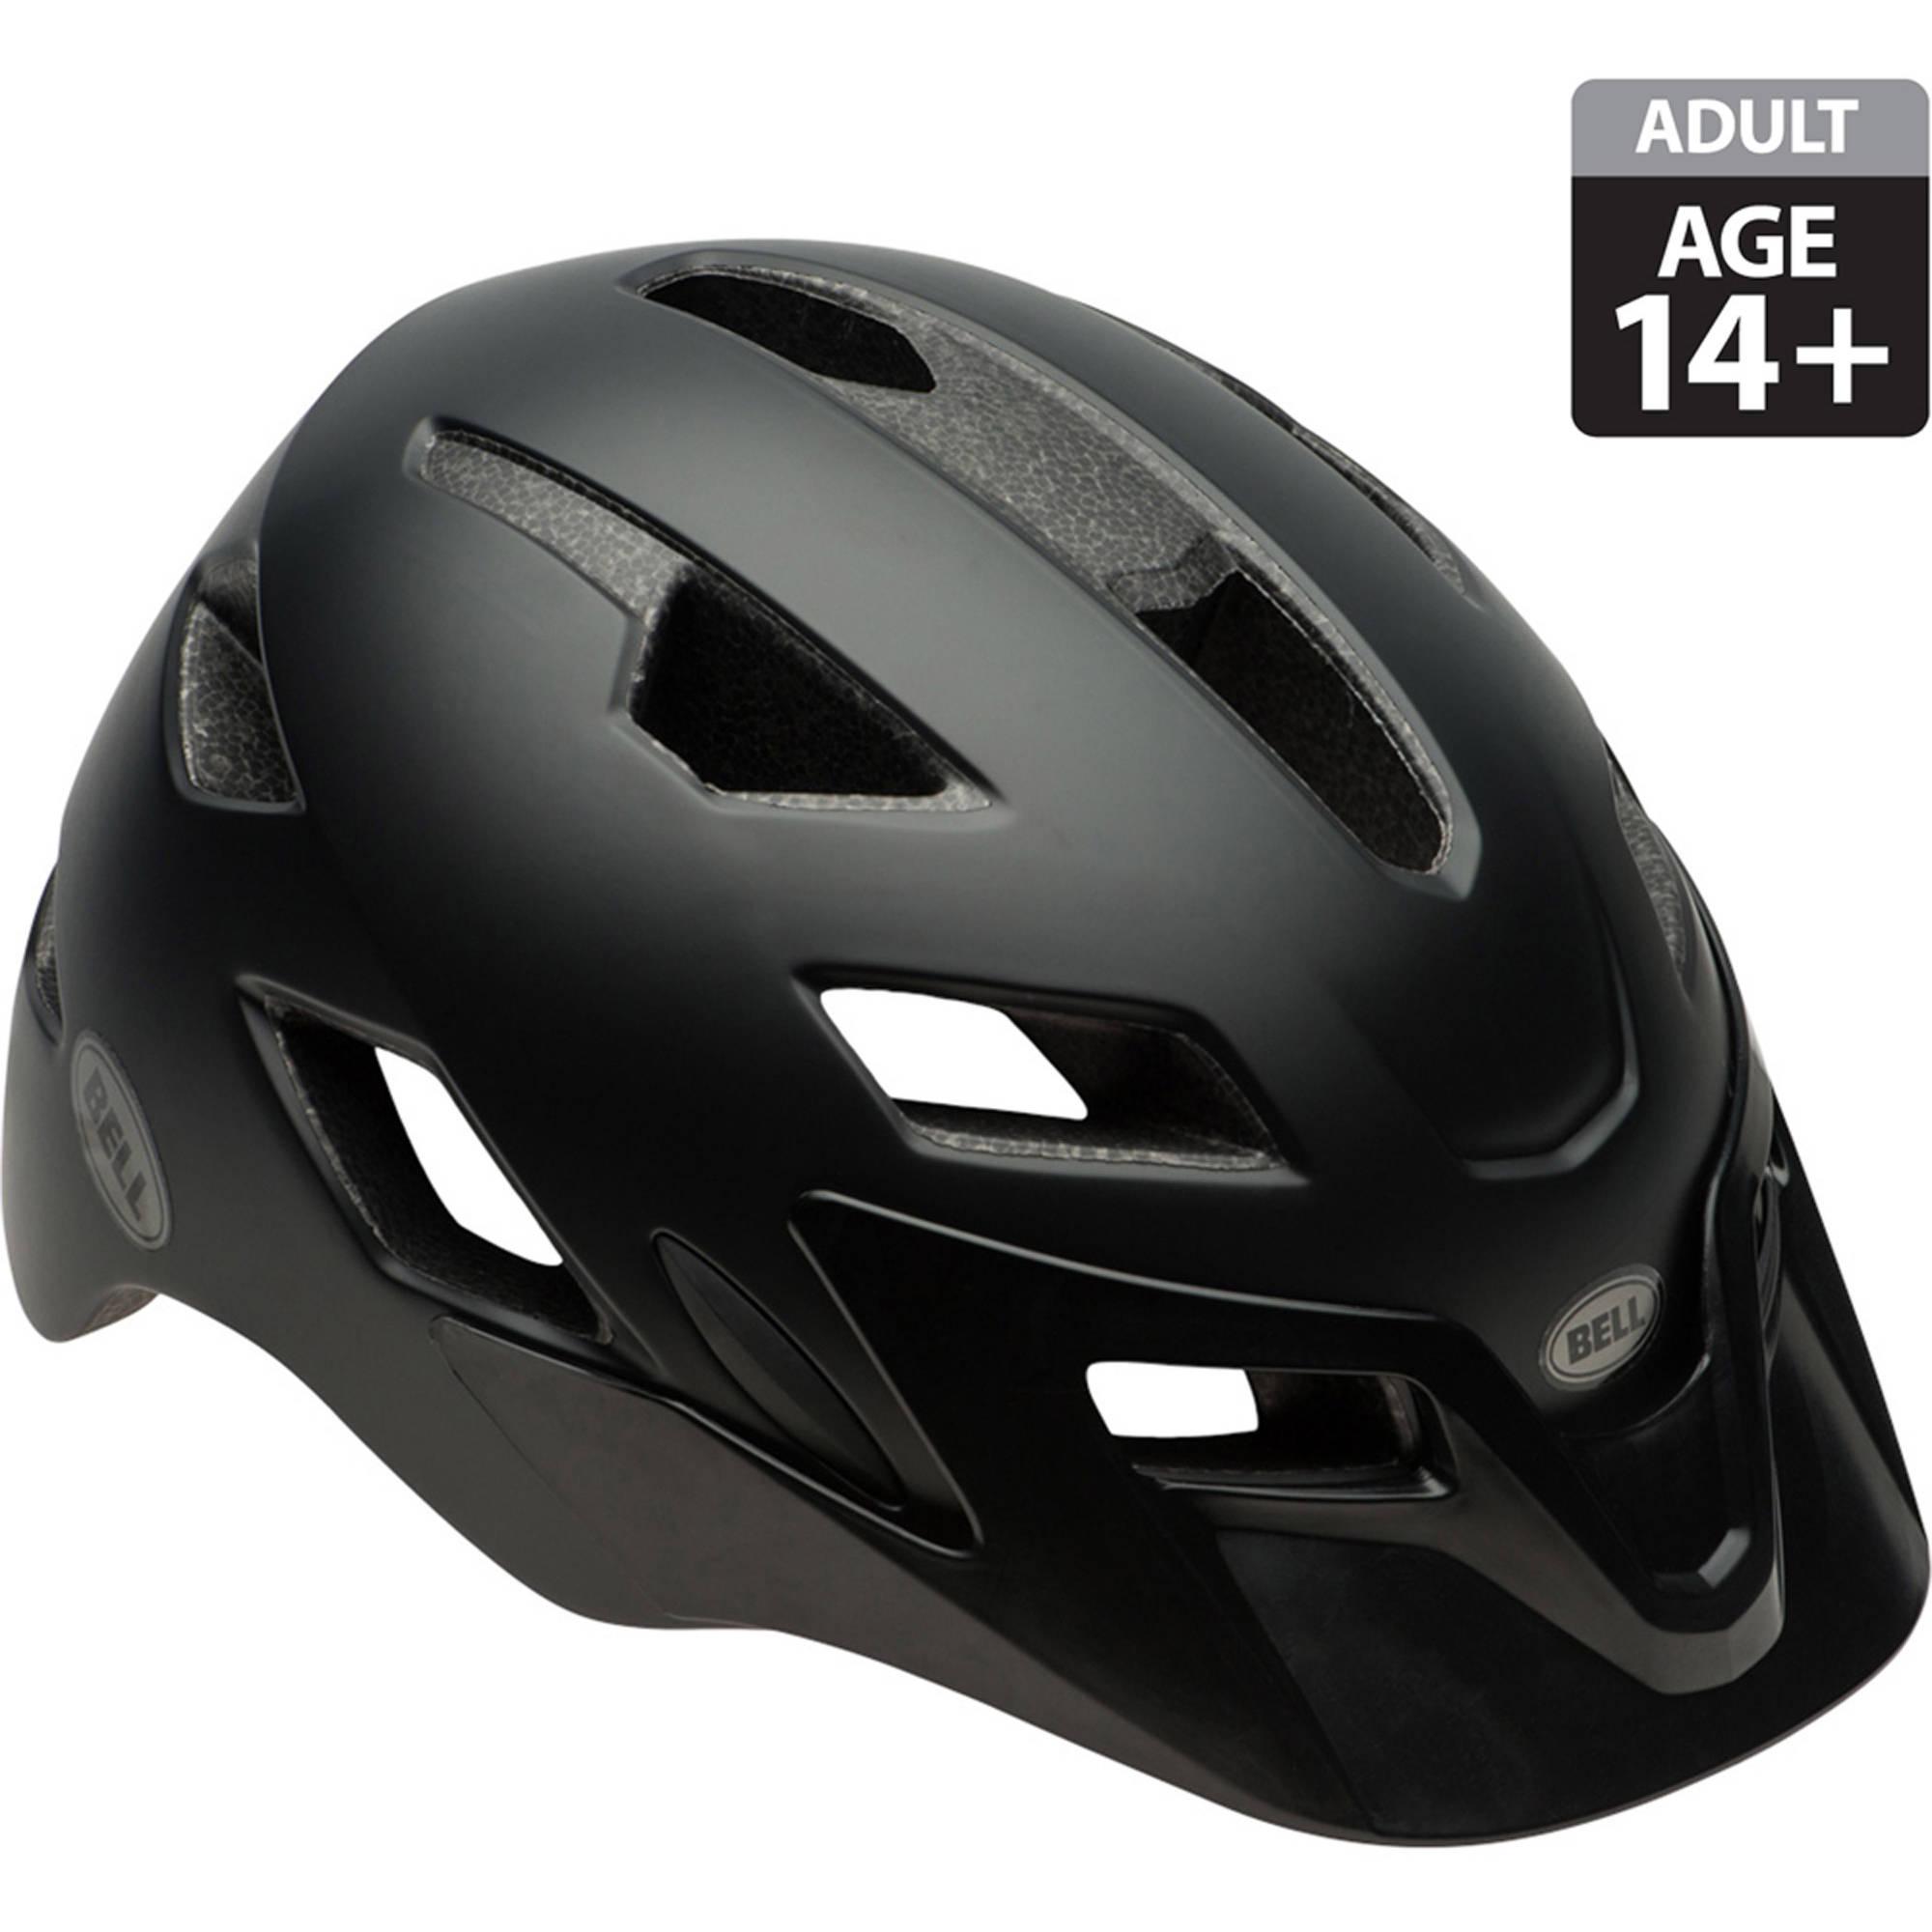 Bell Adult Helmet Terrain, Black